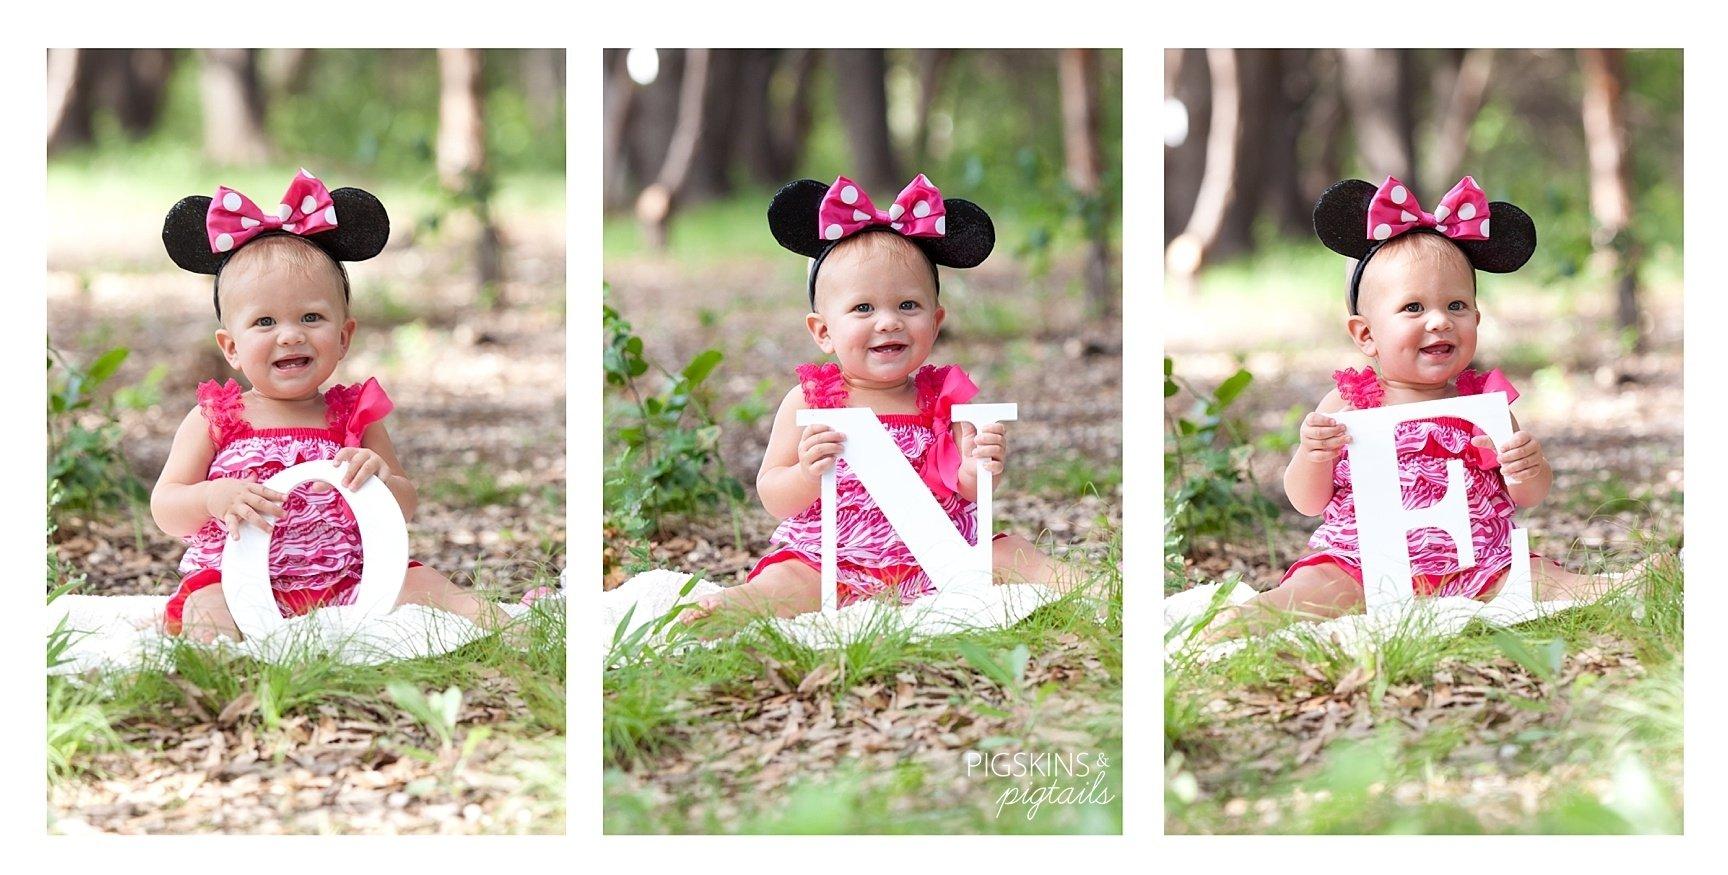 10 Lovely First Birthday Photo Shoot Ideas minnie theme first birthday photo shoot pigskins pigtails 1 2020